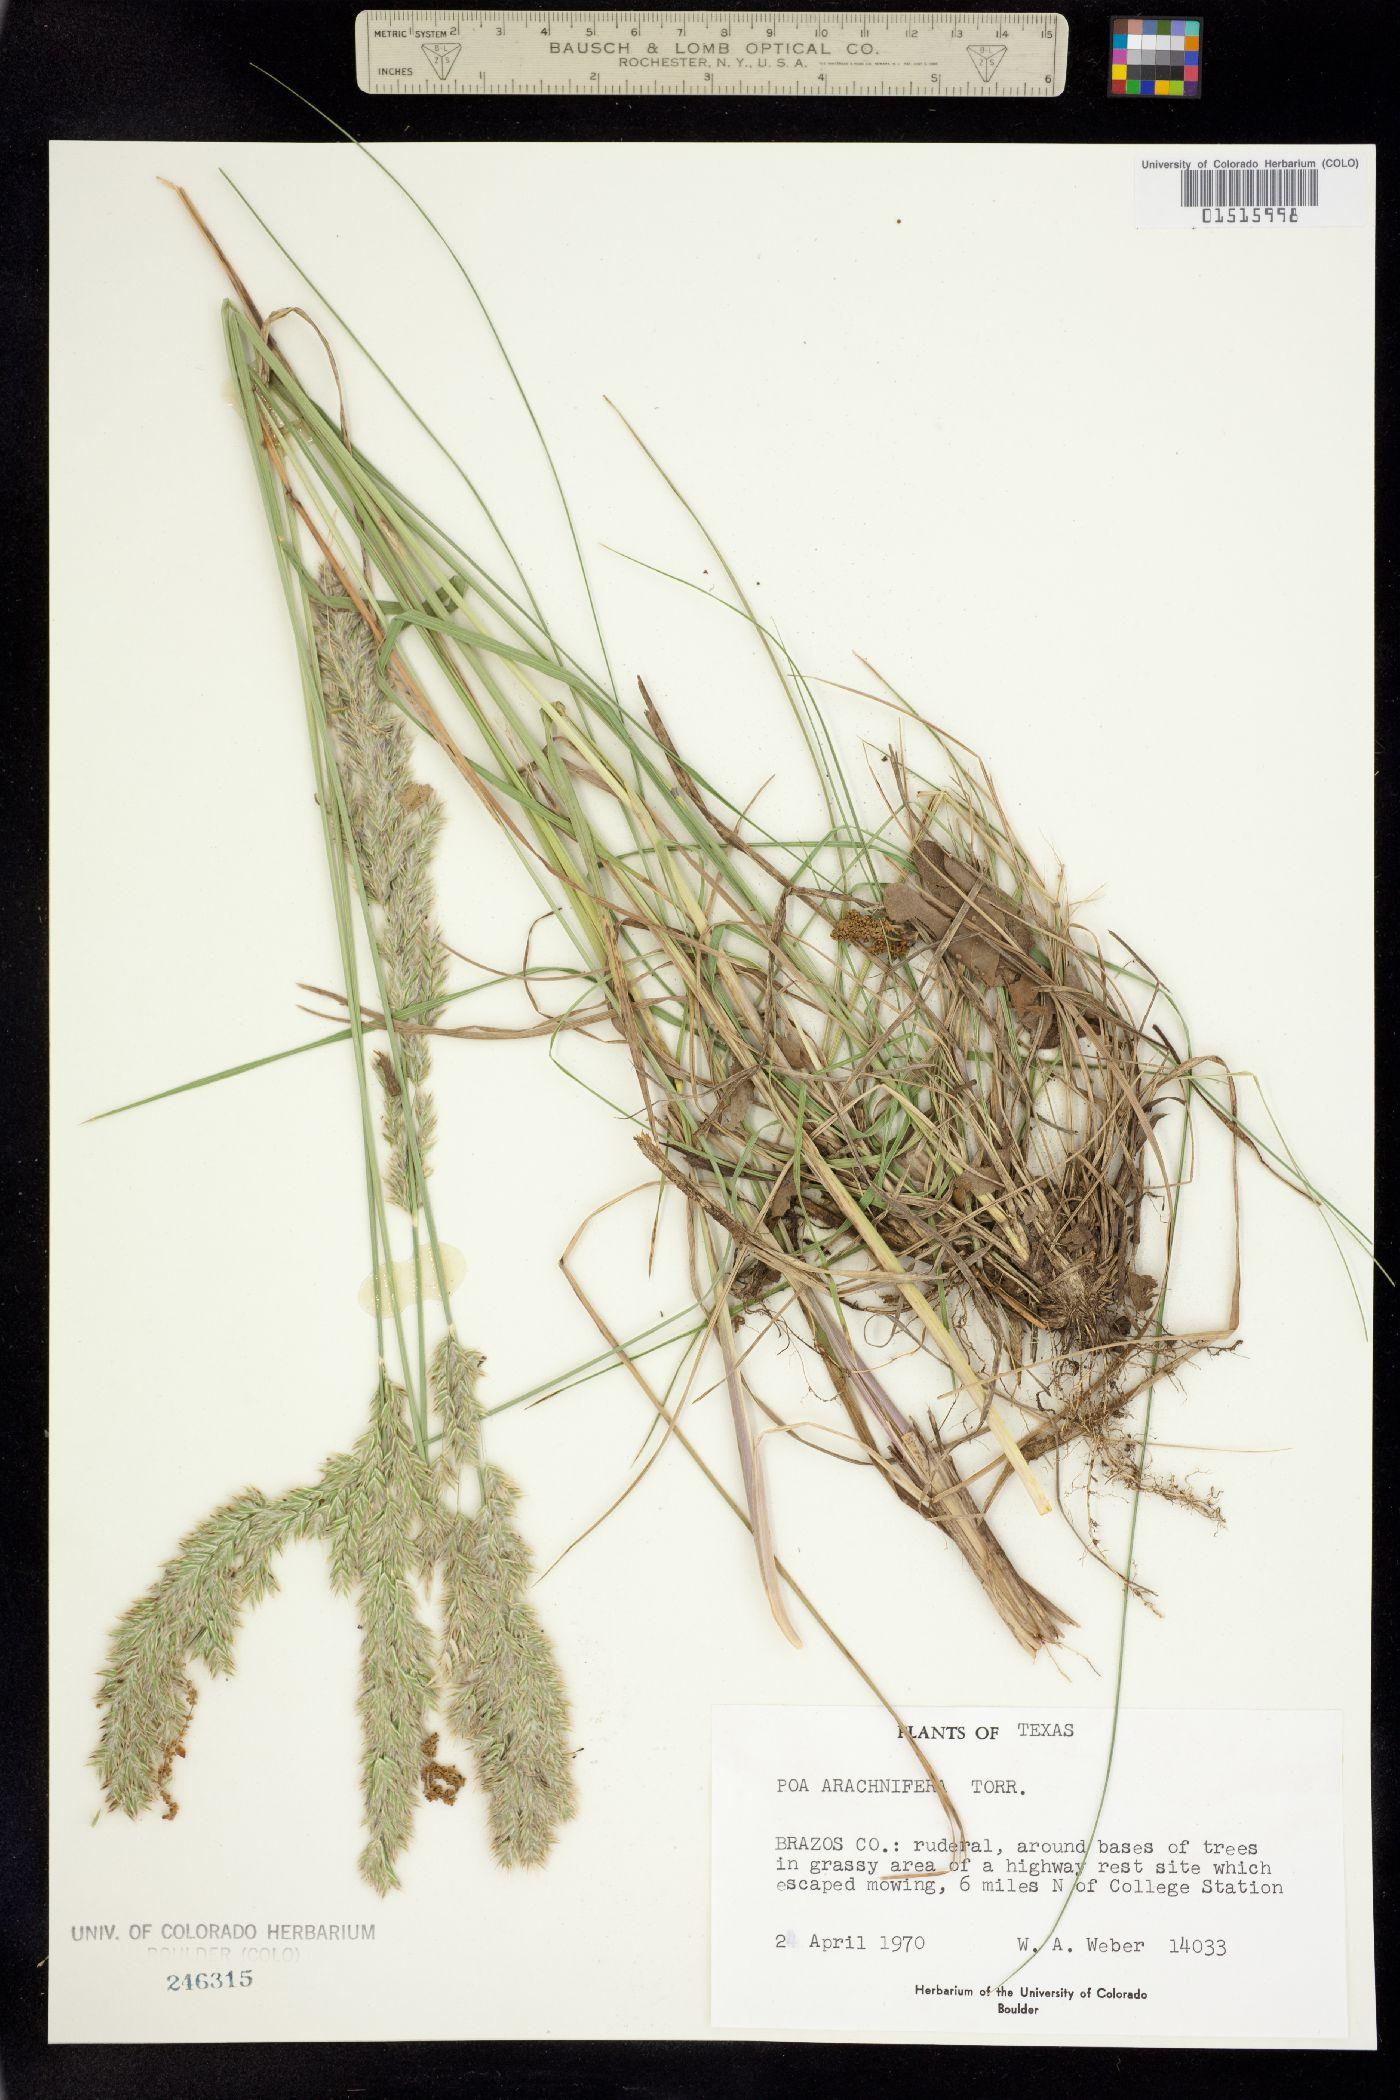 Poa arachnifera image